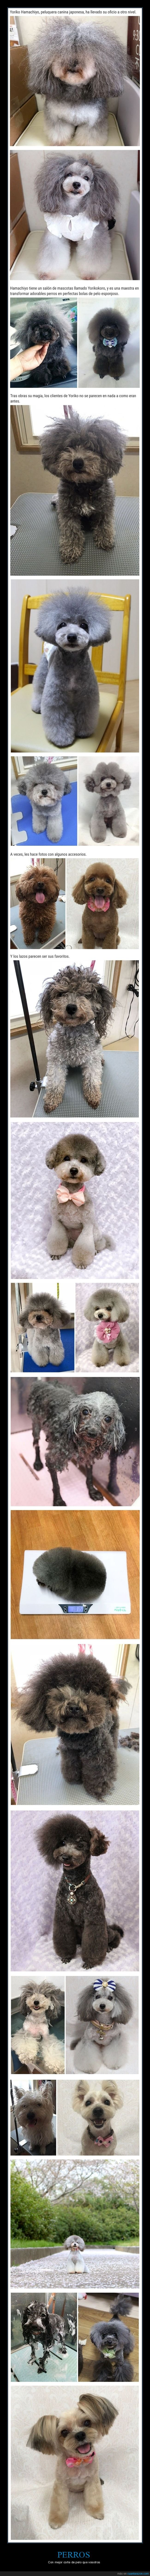 corte de pelo,peluquera,perros